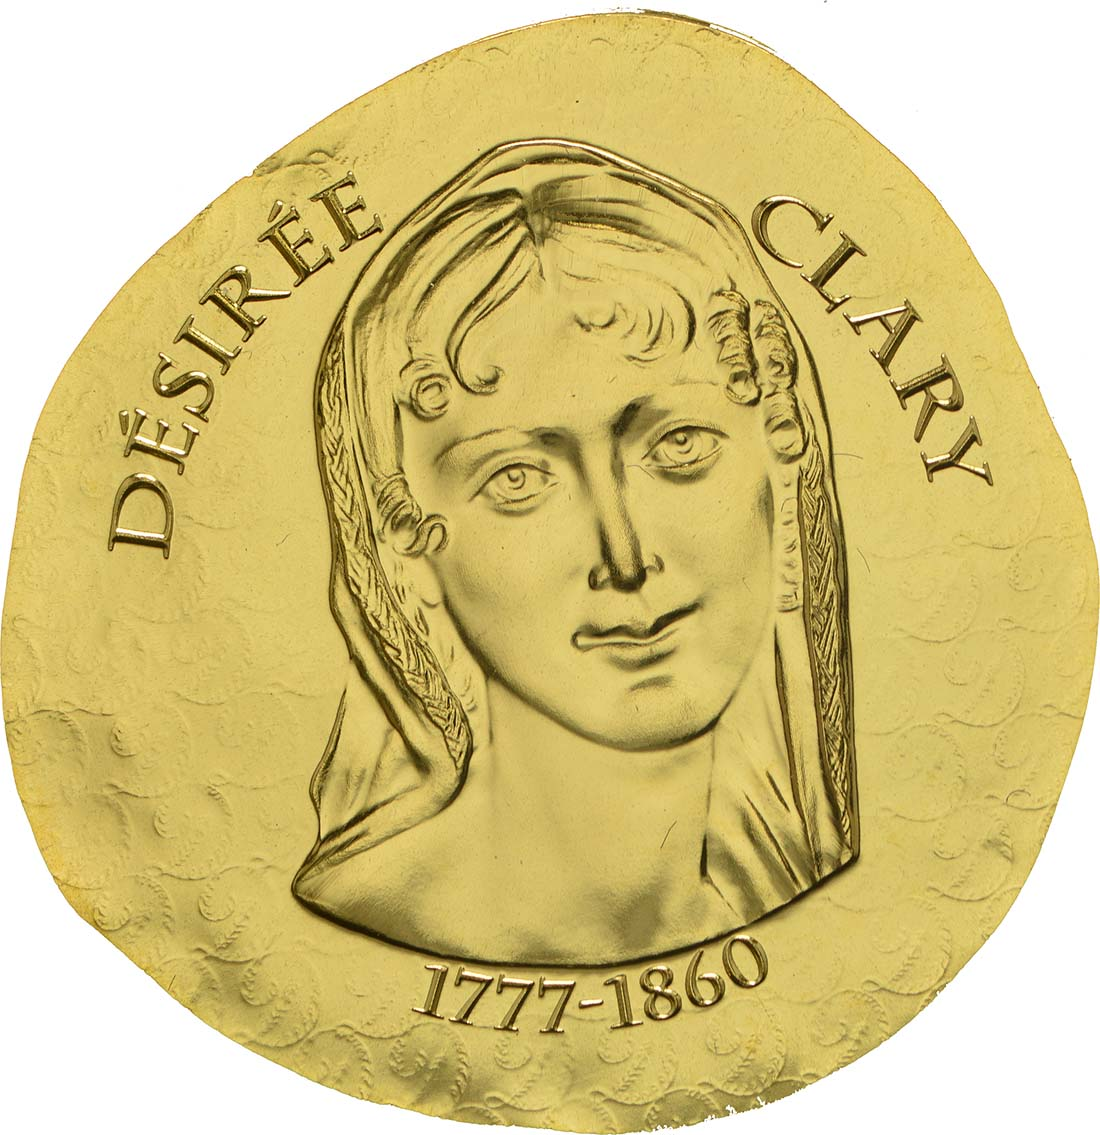 Vorderseite :Frankreich : 50 Euro Désirée Clary  2018 PP